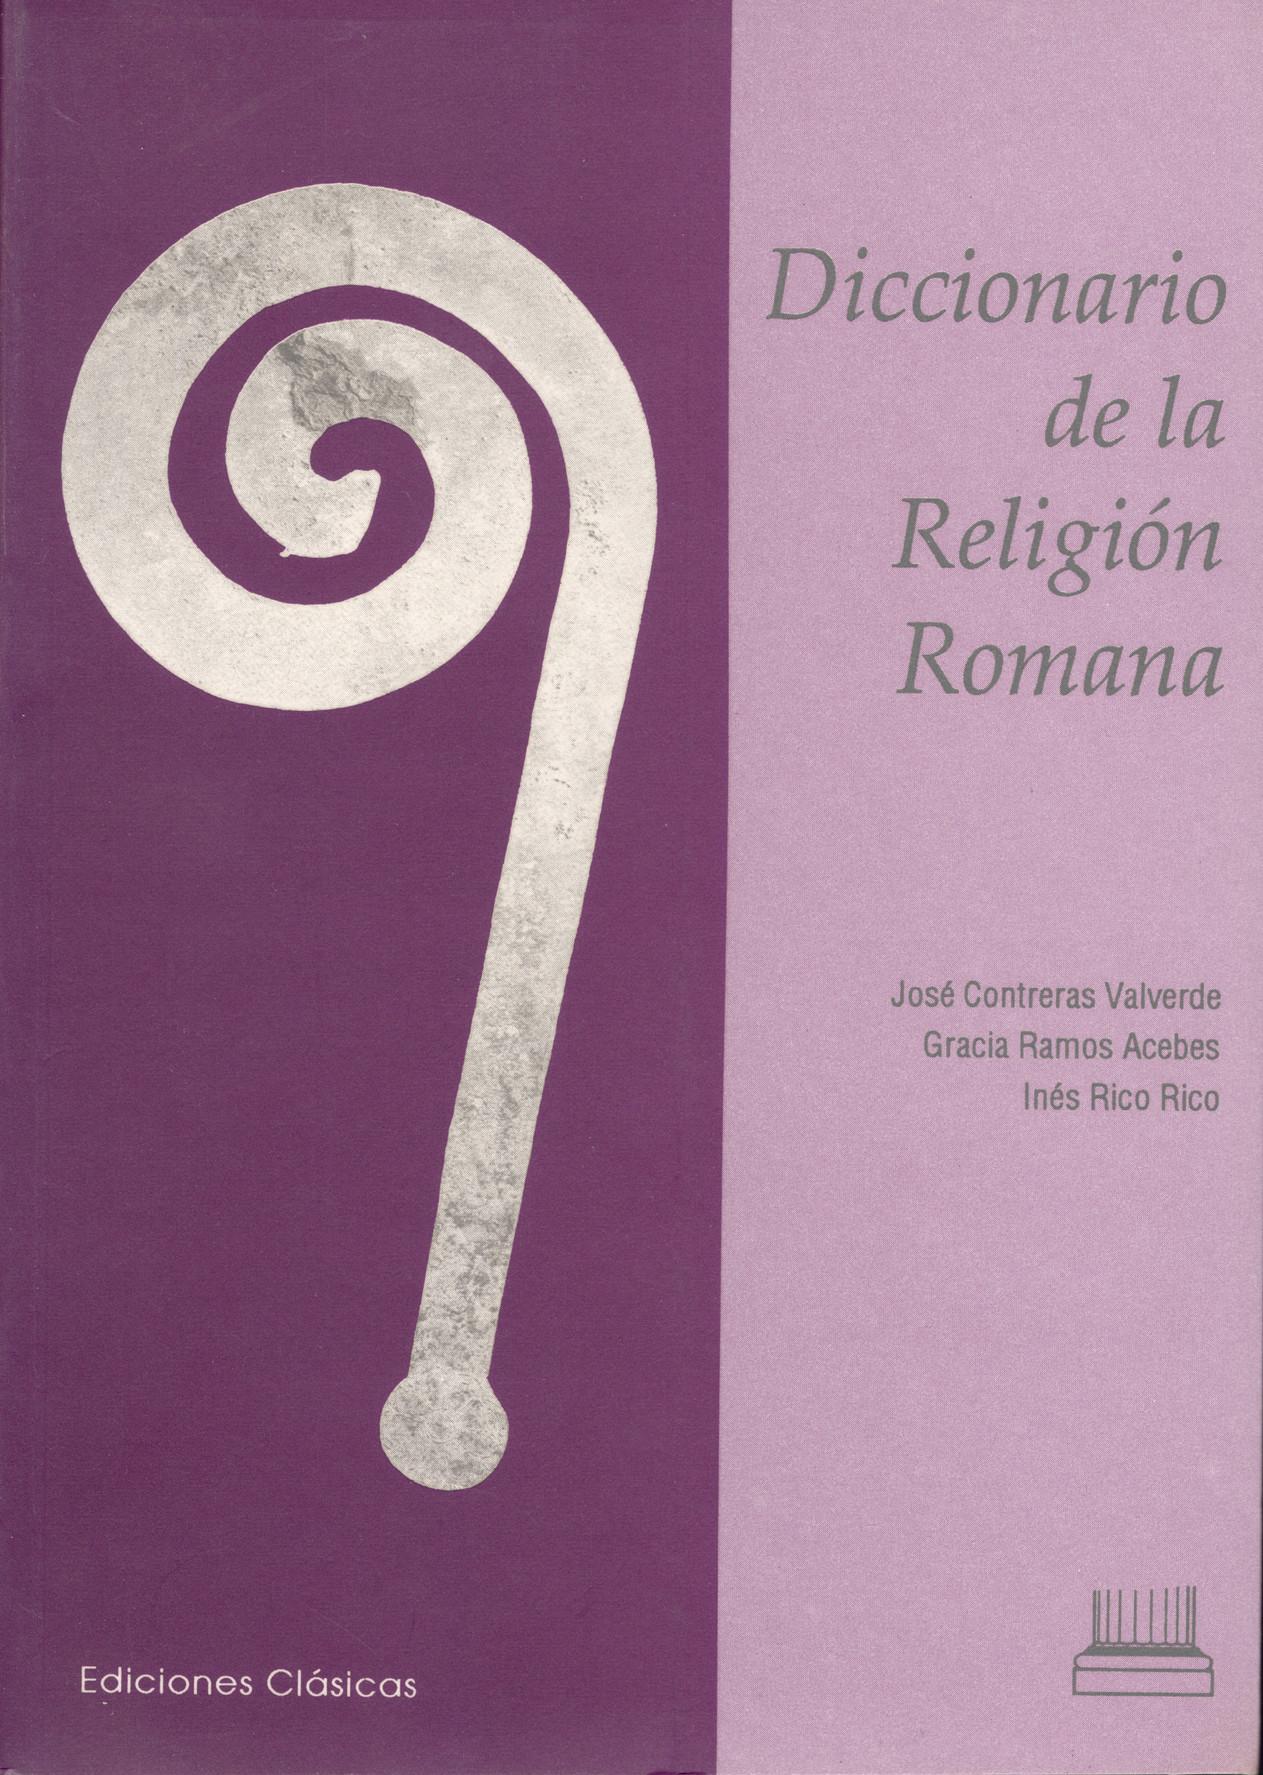 DICCIONARIO DE LA RELIGION ROMANA